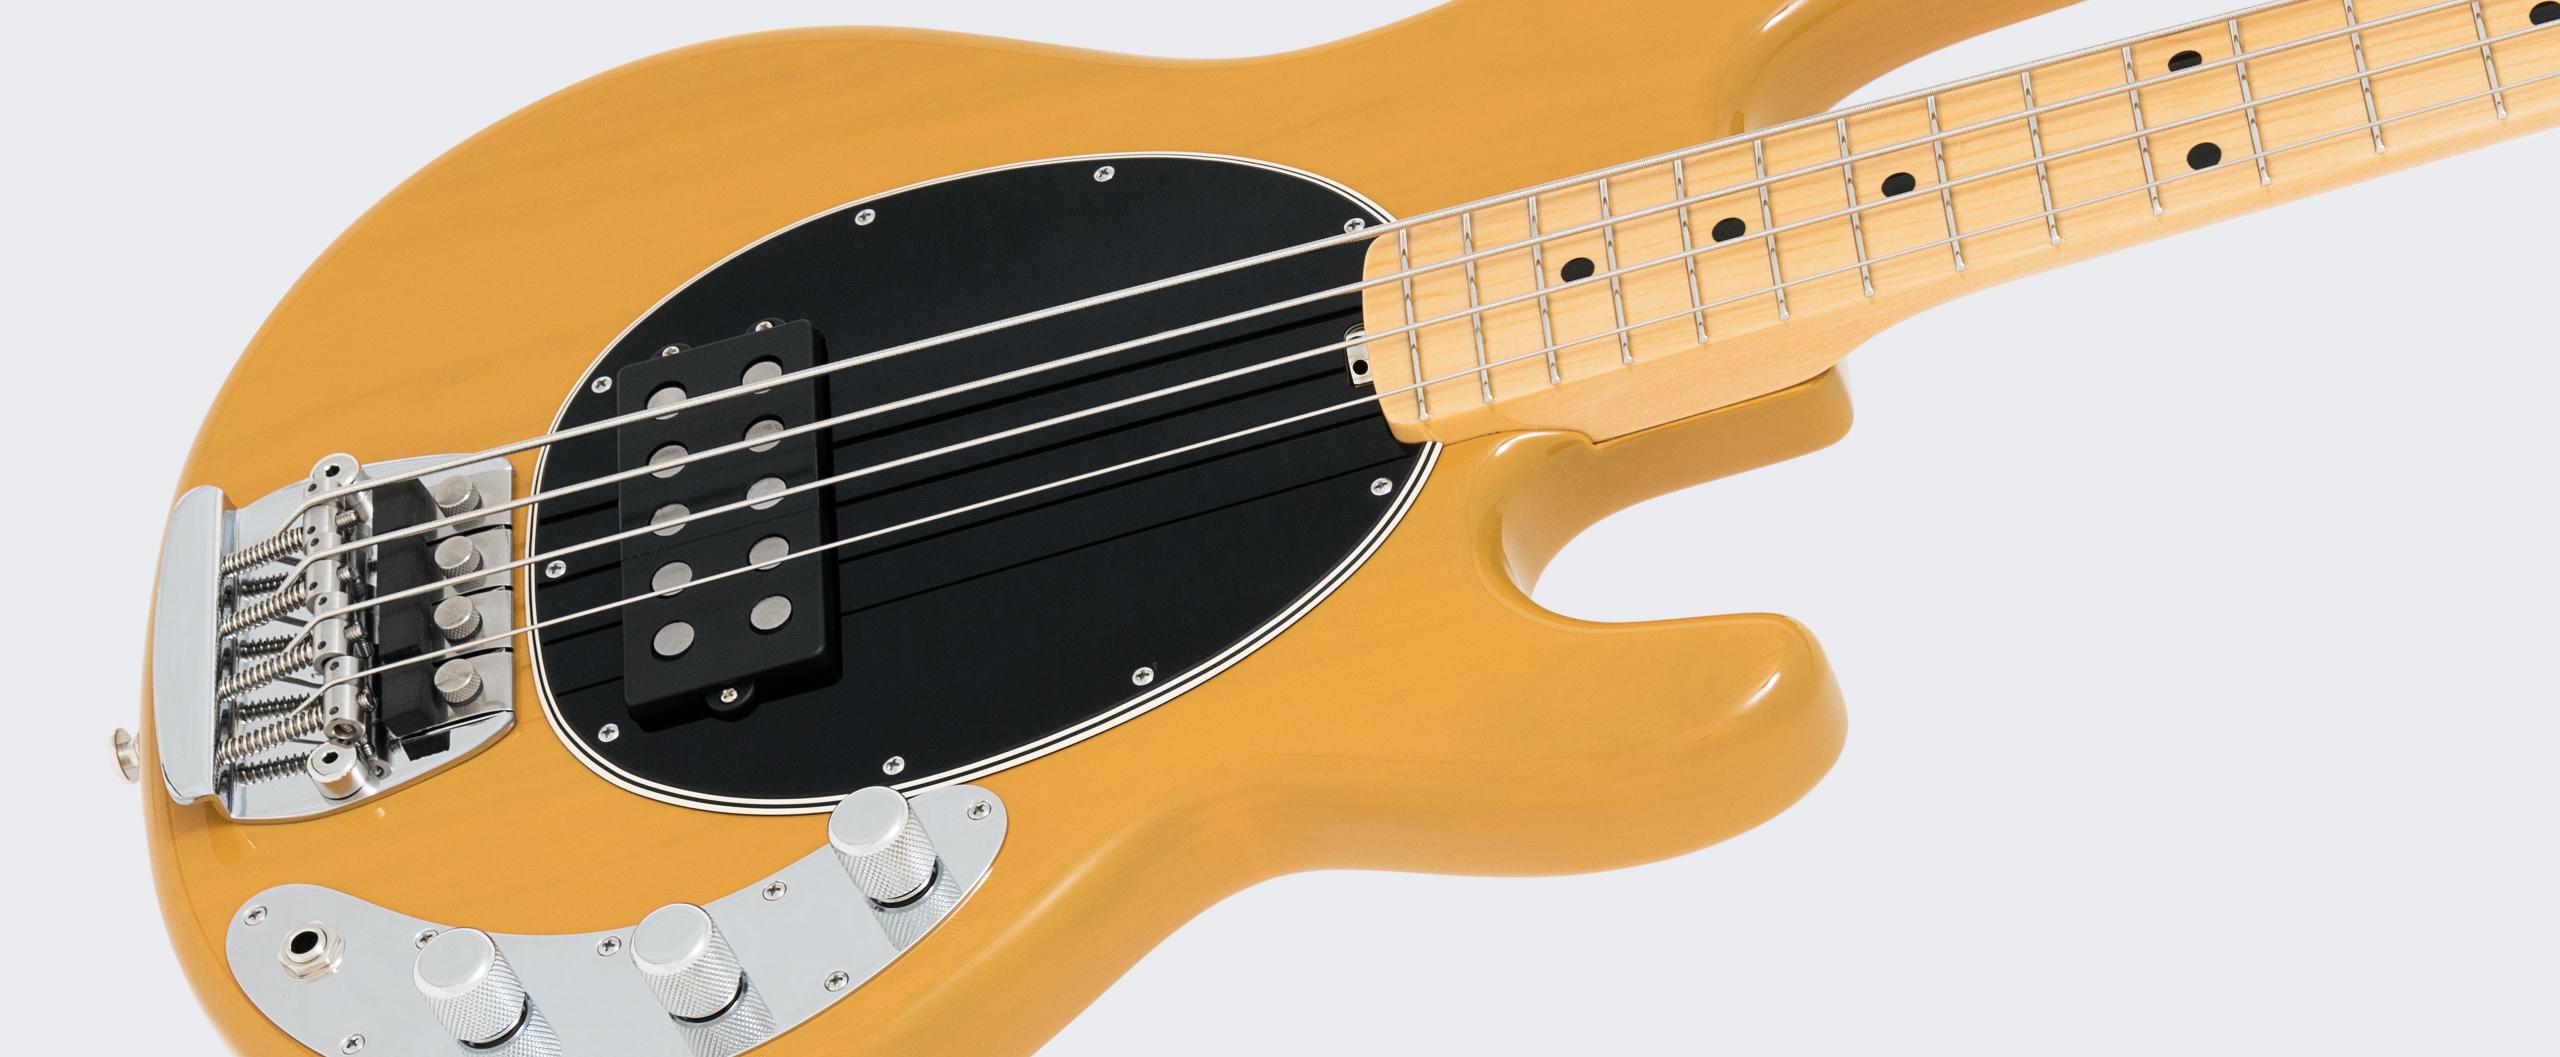 Ernie Ball Music Man 40th Anniversary StingRay Bass Slide-59